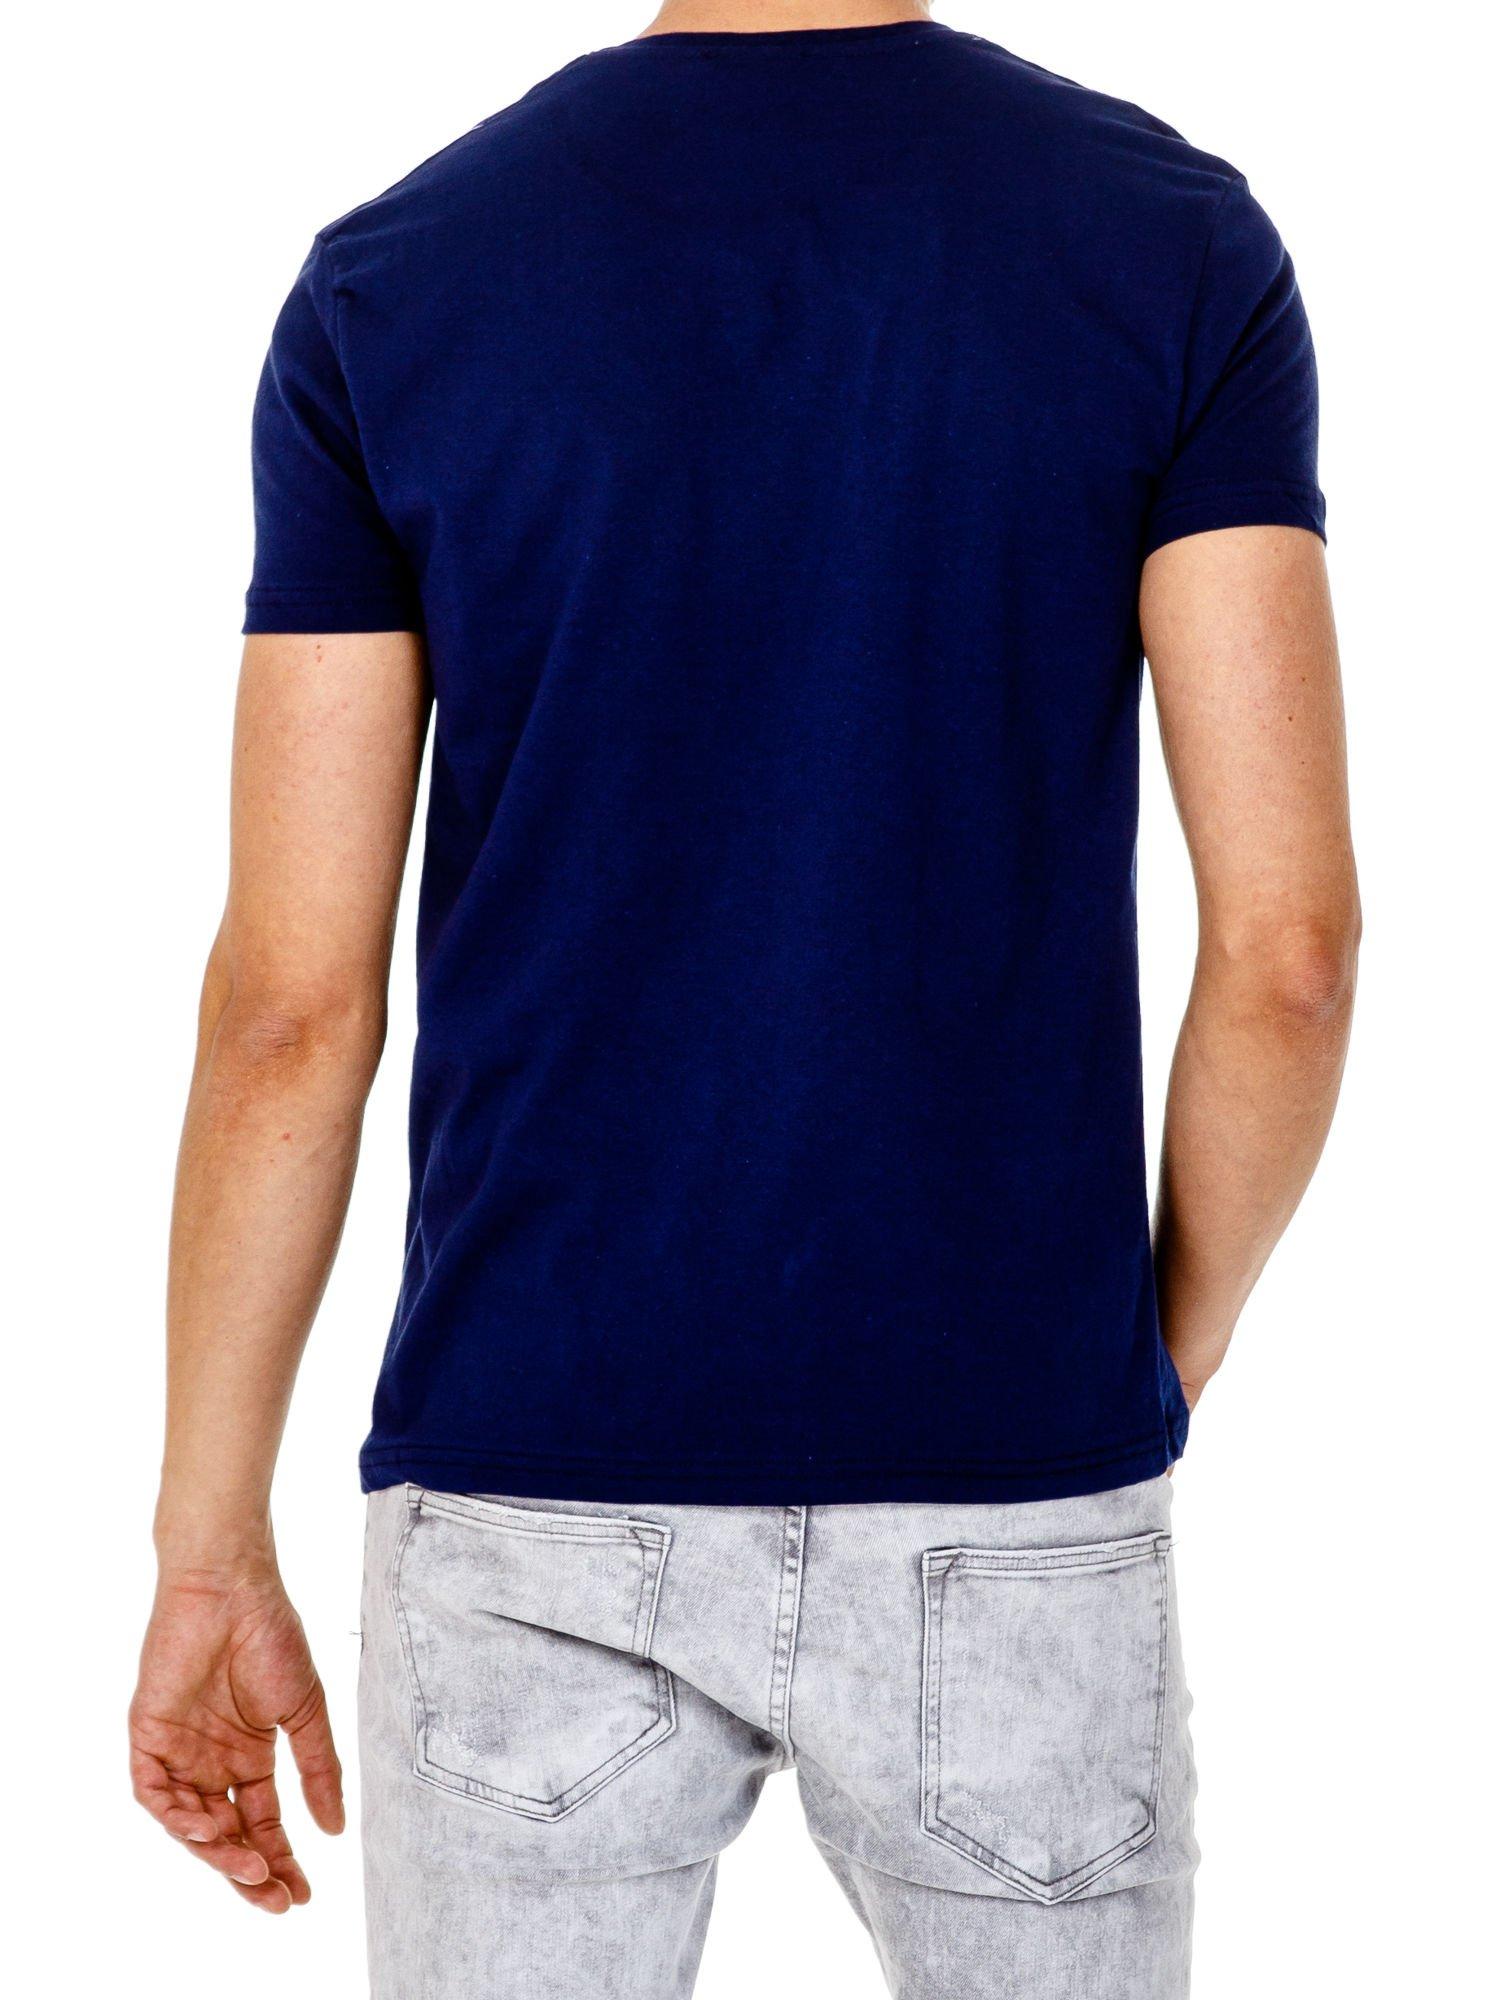 Granatowy t-shirt męski z marynarskim motywem i napisem SAILING                                  zdj.                                  5